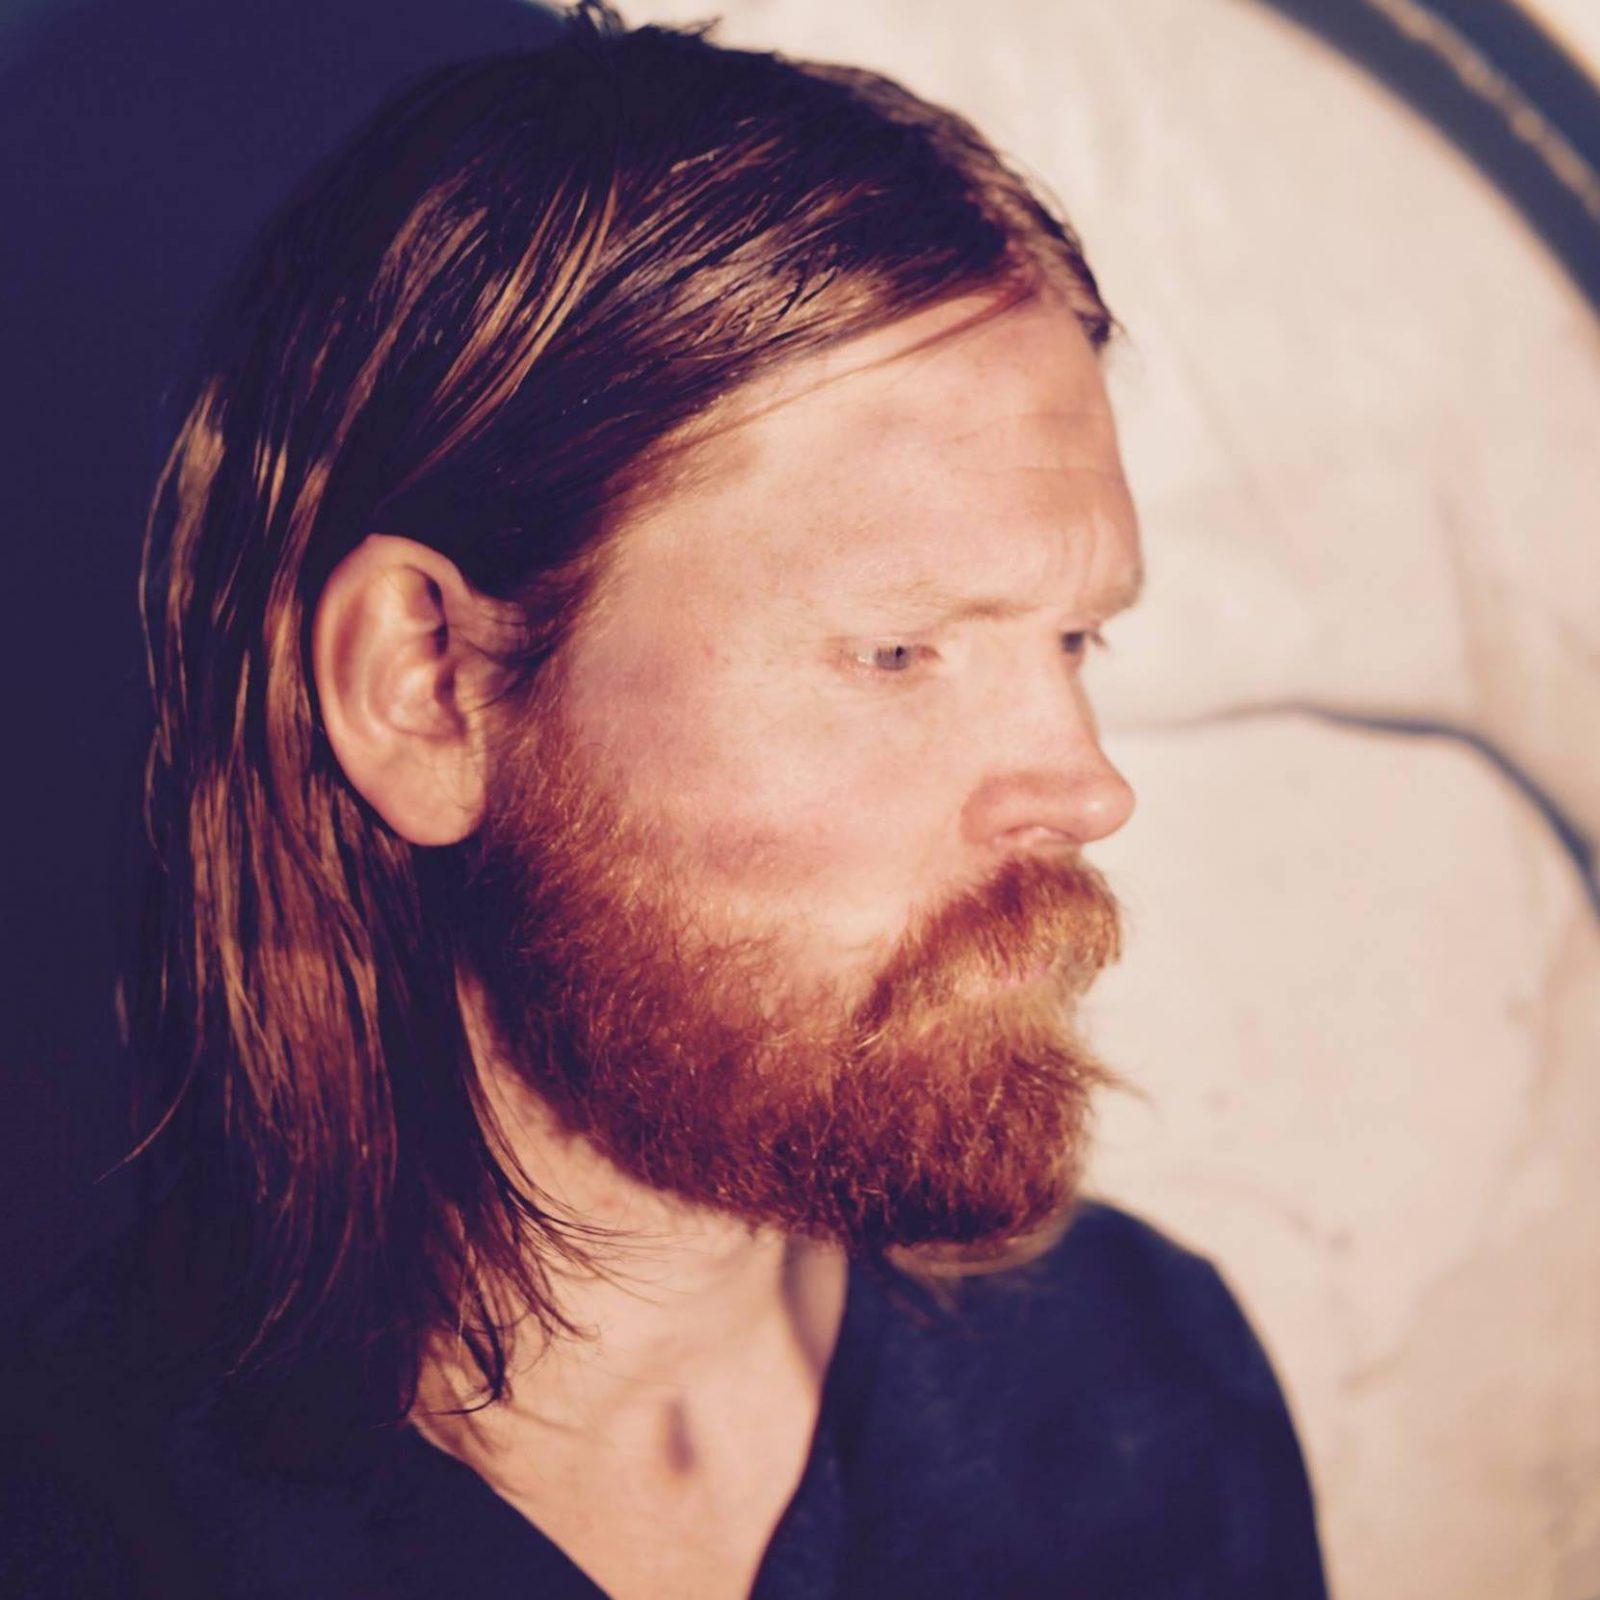 Nordic Playlist #103 – Júníus Meyvant, Iceland